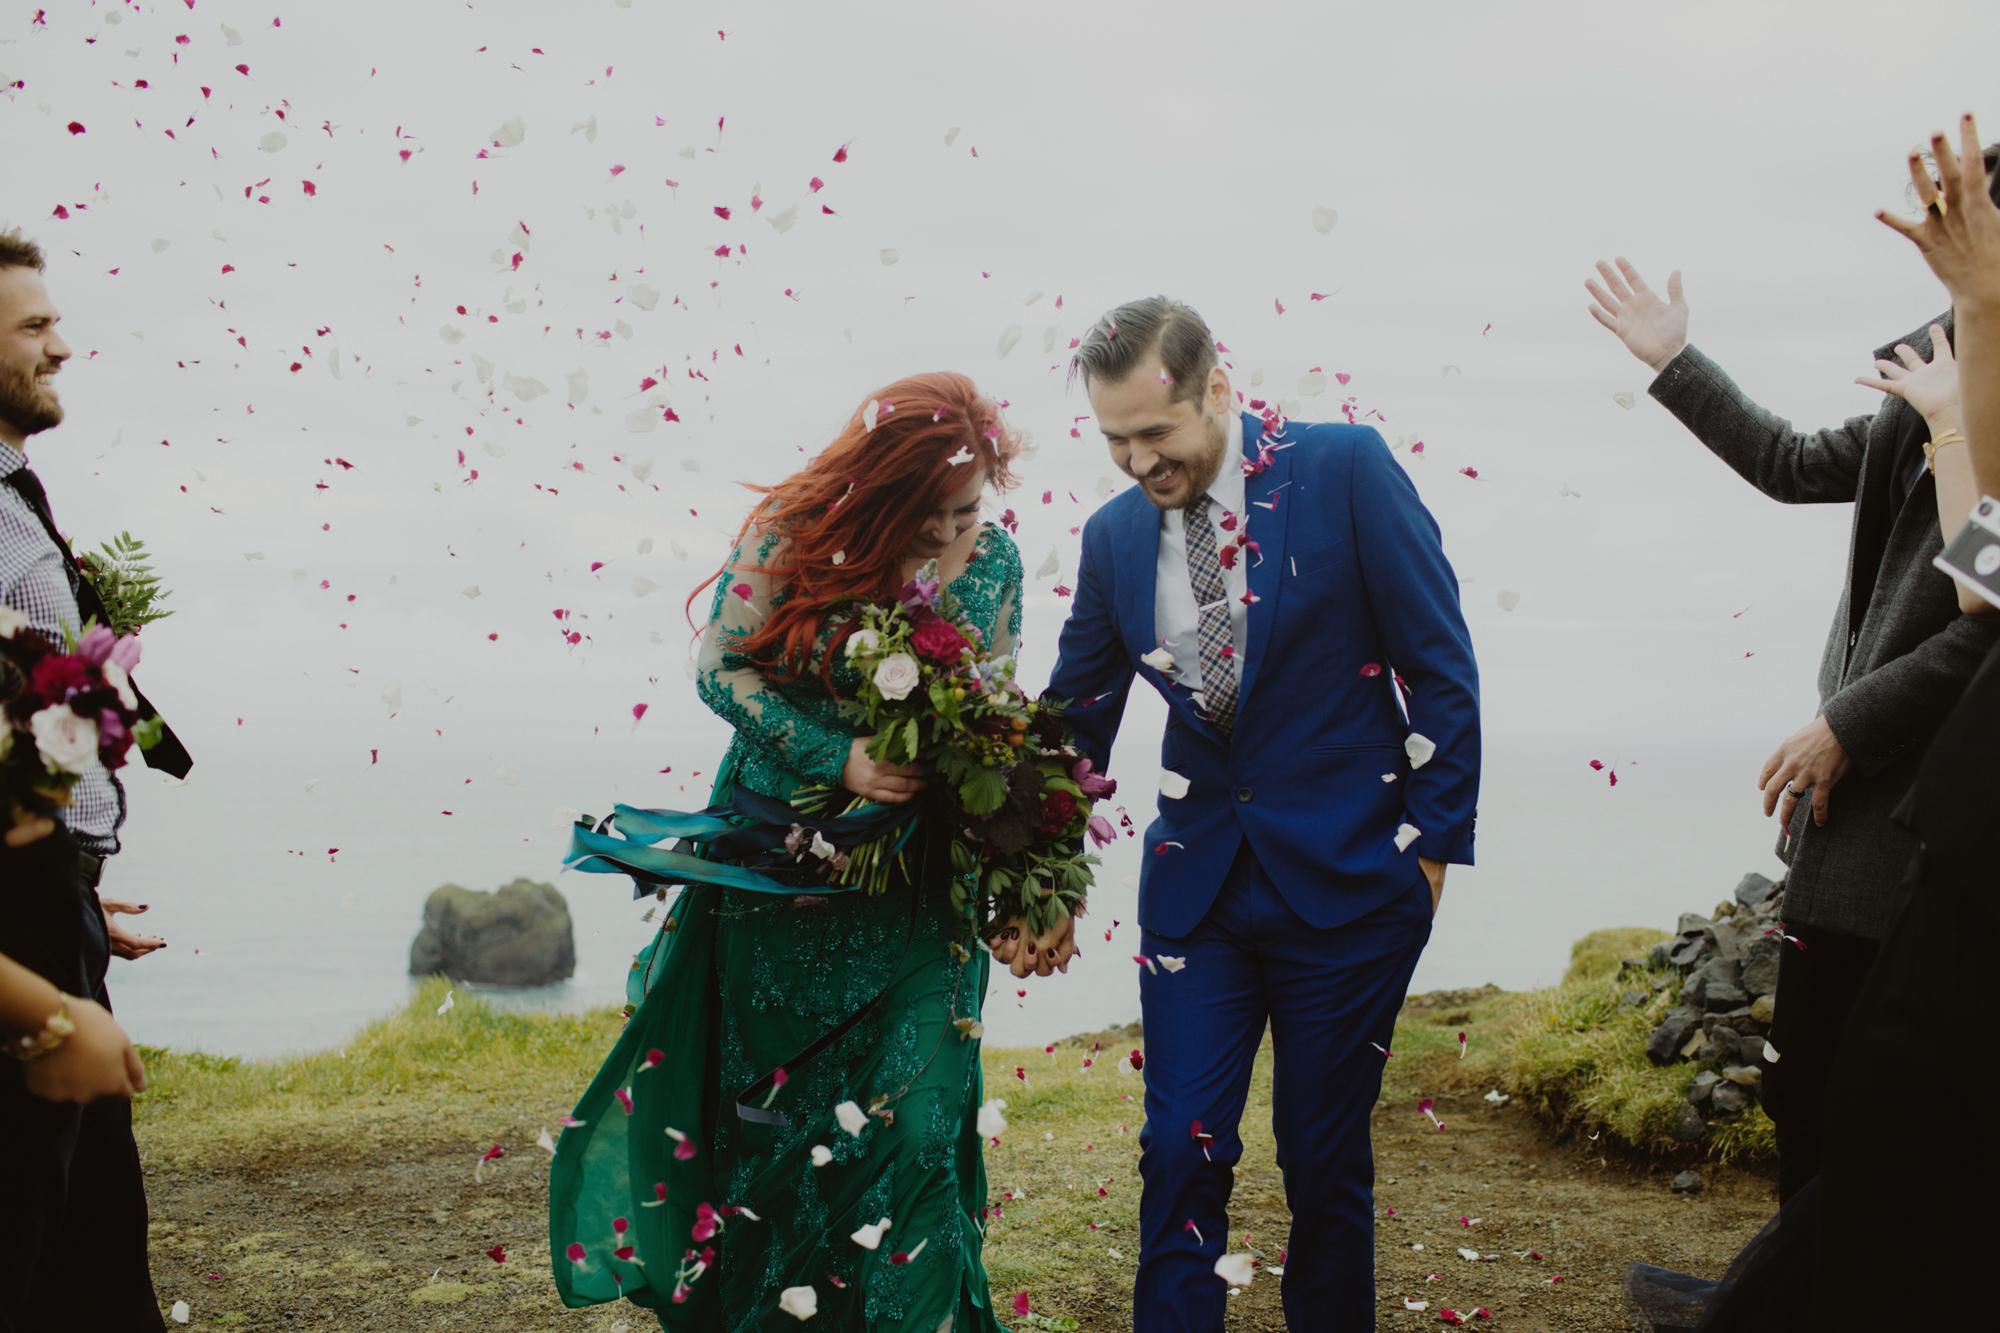 iceland_elopement_wedding_sammblake_052.jpg